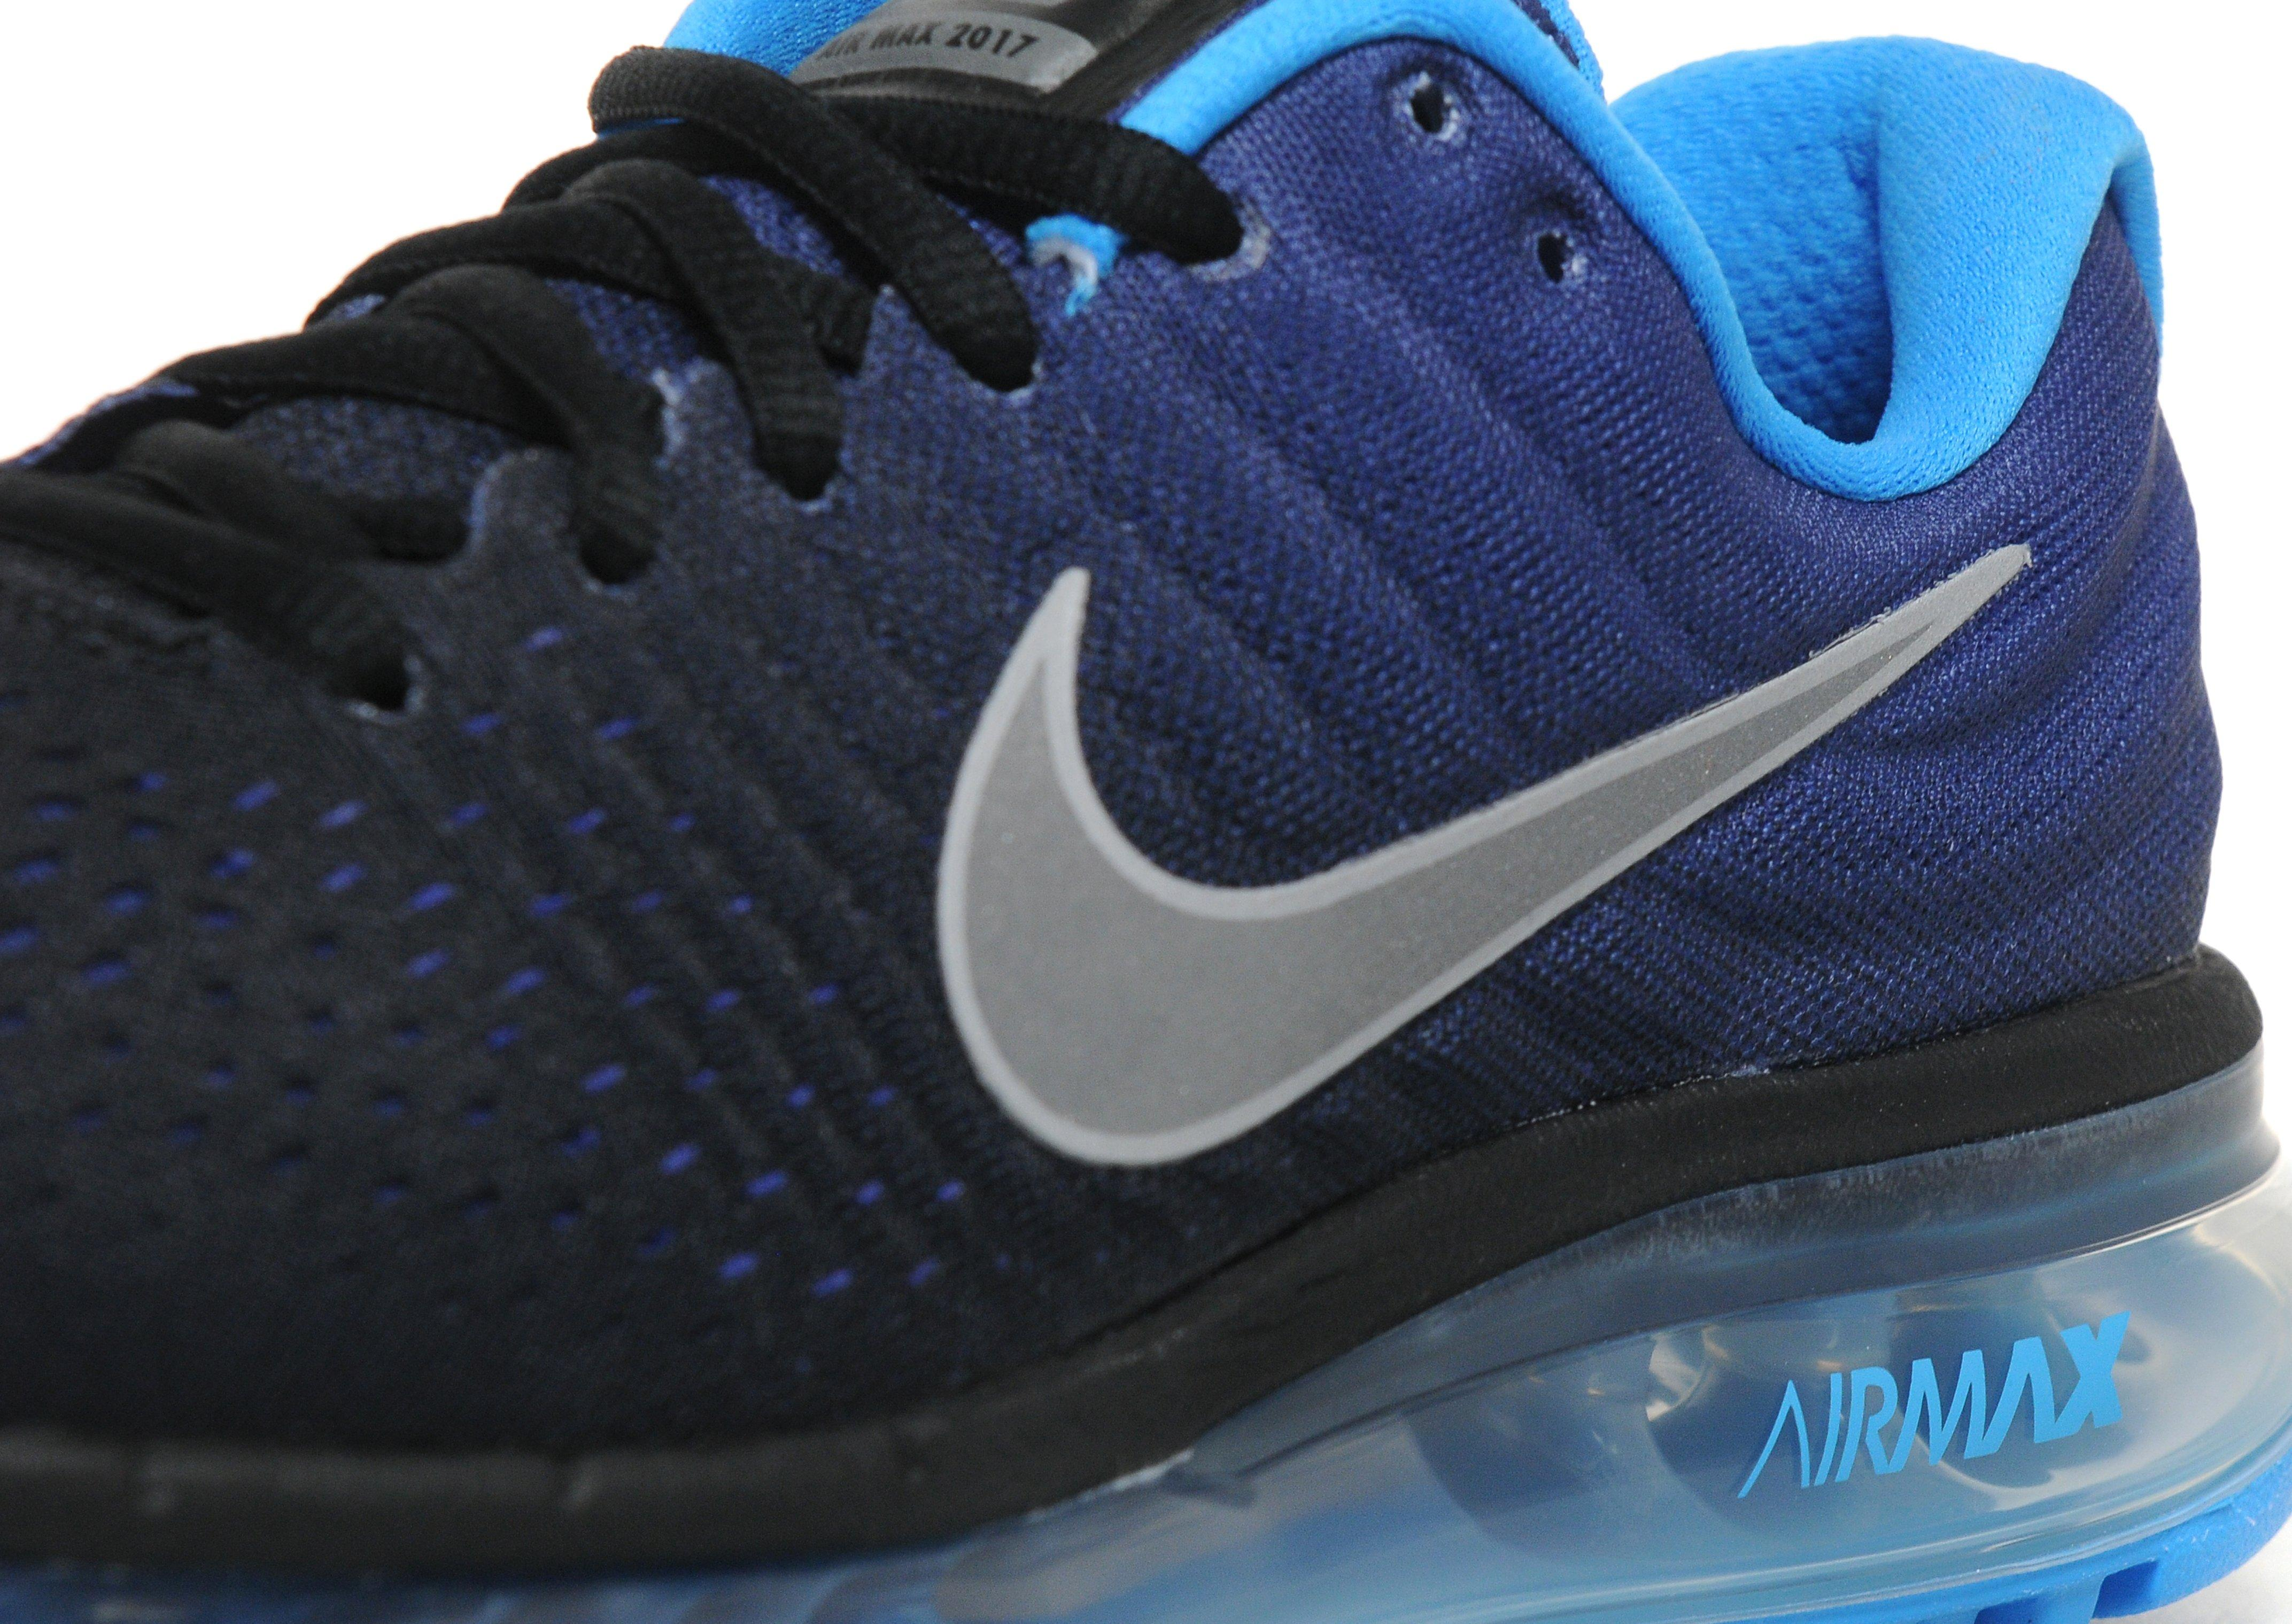 official photos e455f 948a8 Nike Max Size 1.5 Juniors